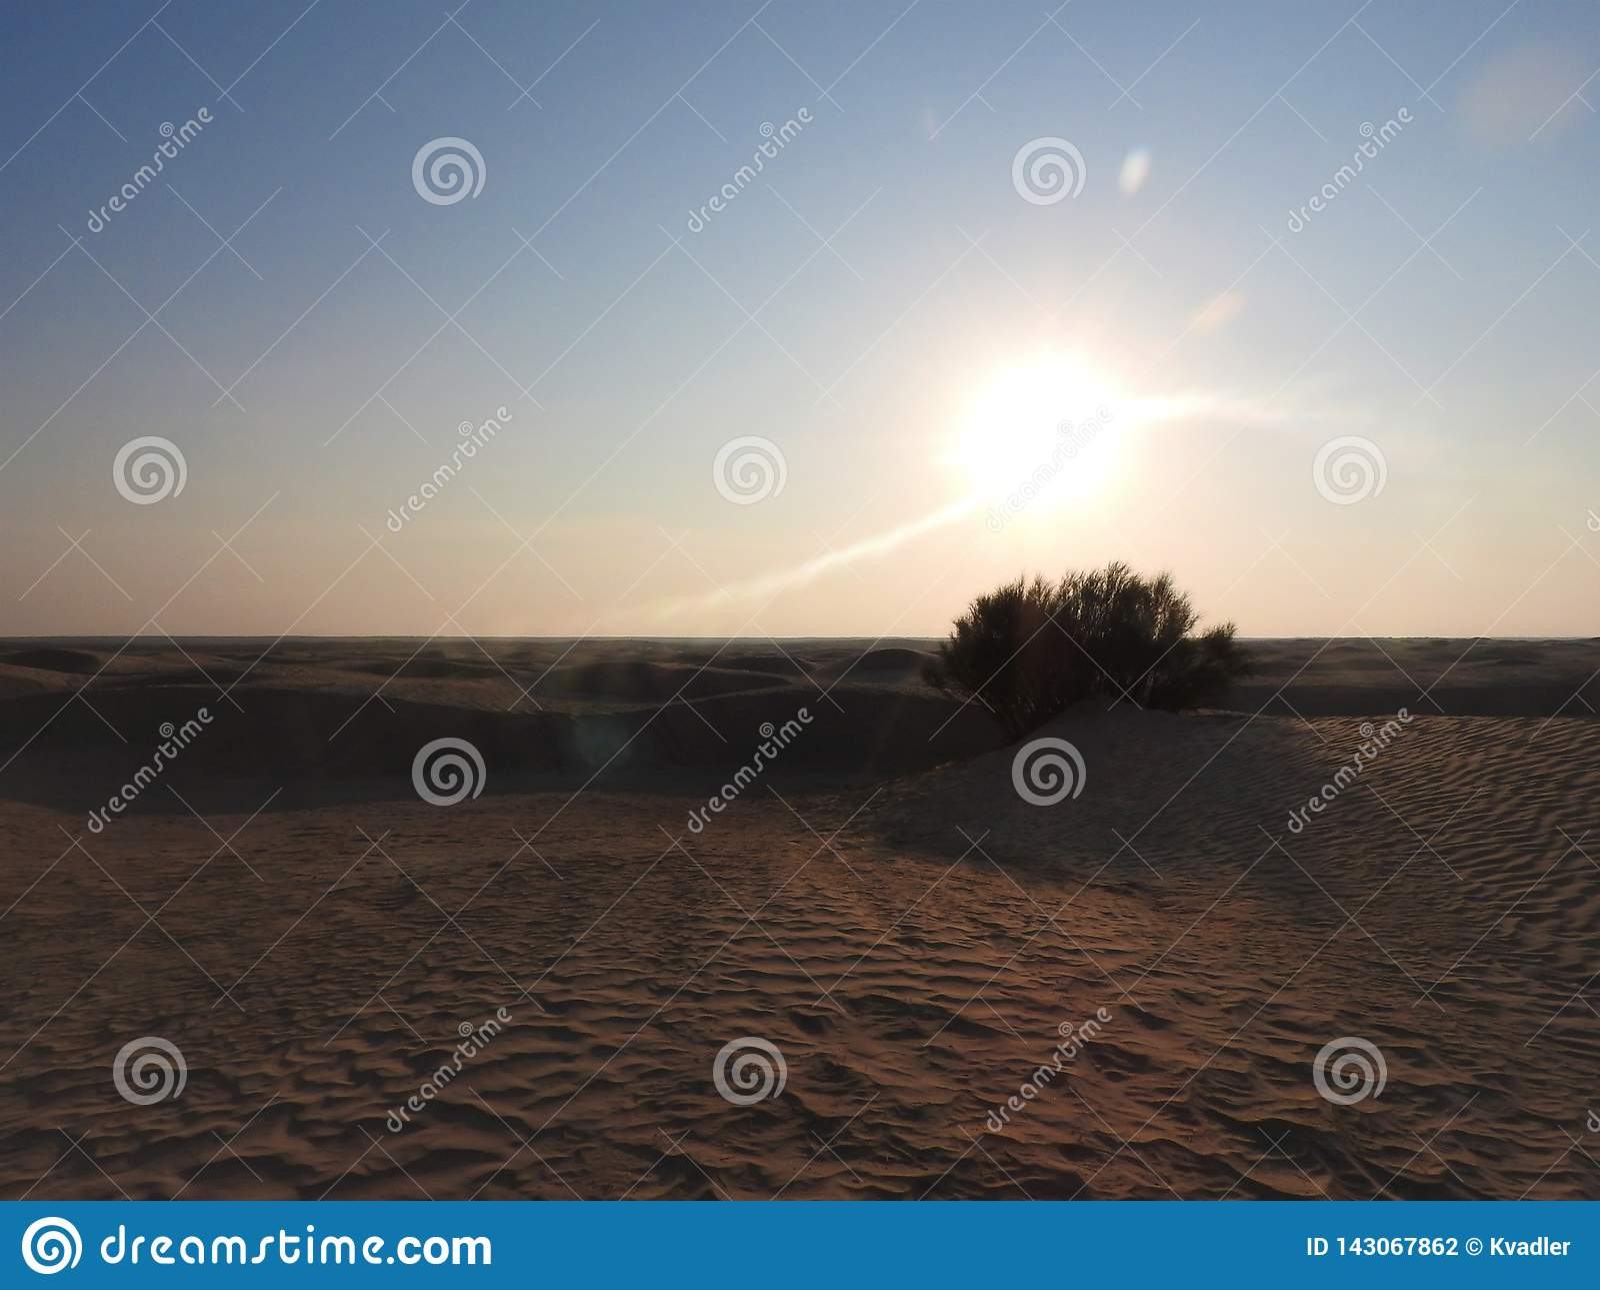 Beautiful sunrise and sand dunes in Sahara desert, Africa